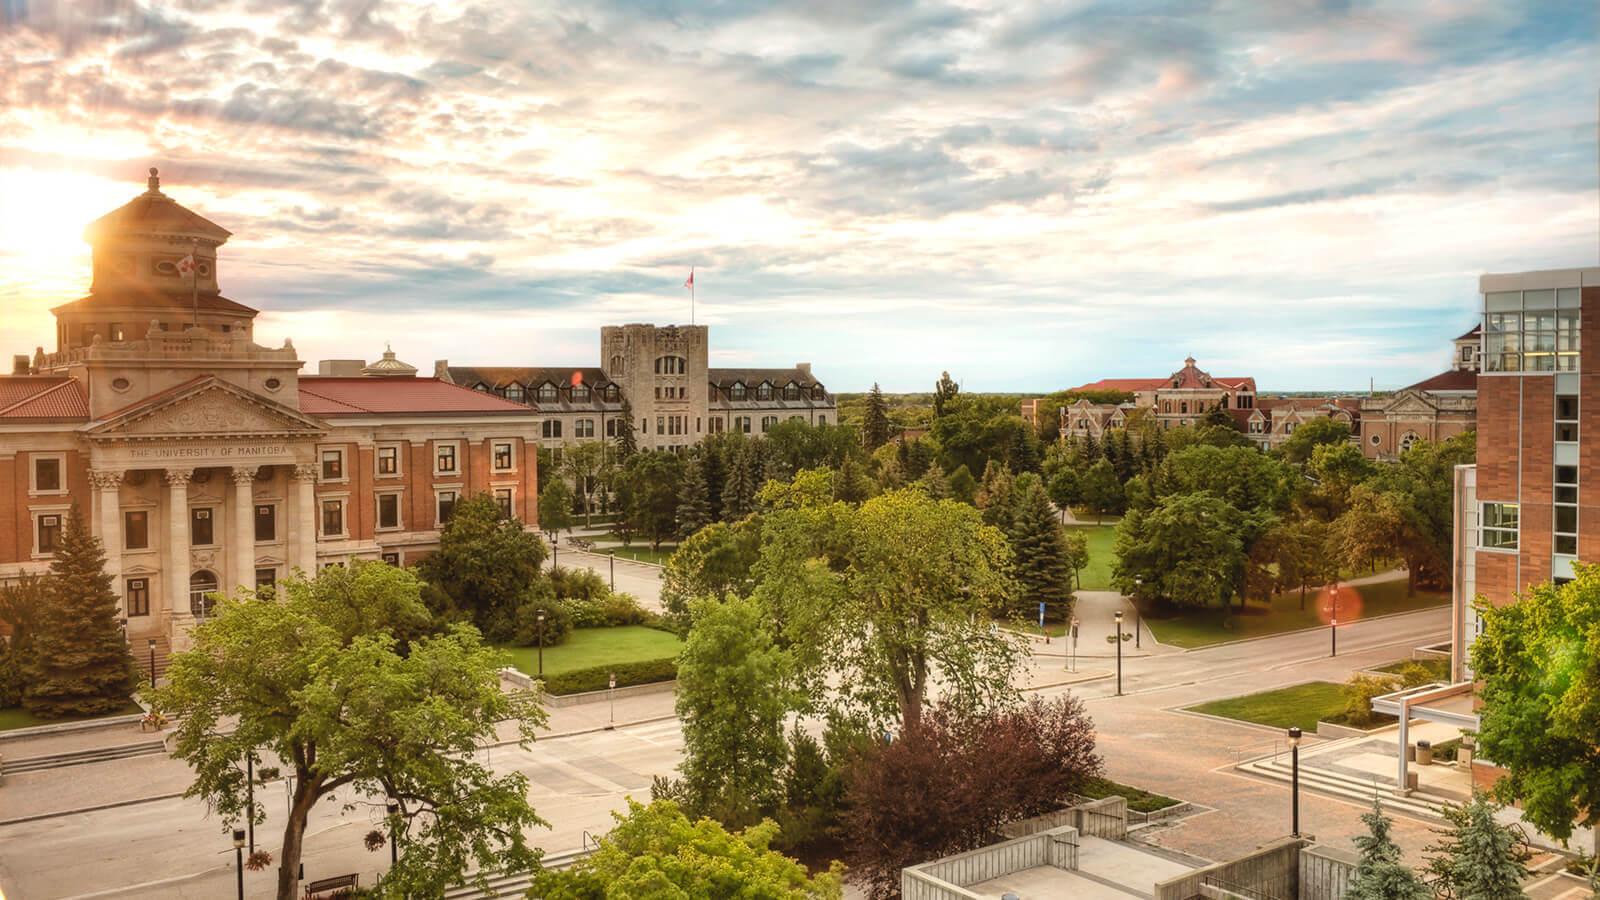 24ecb9d8c2d University of Manitoba